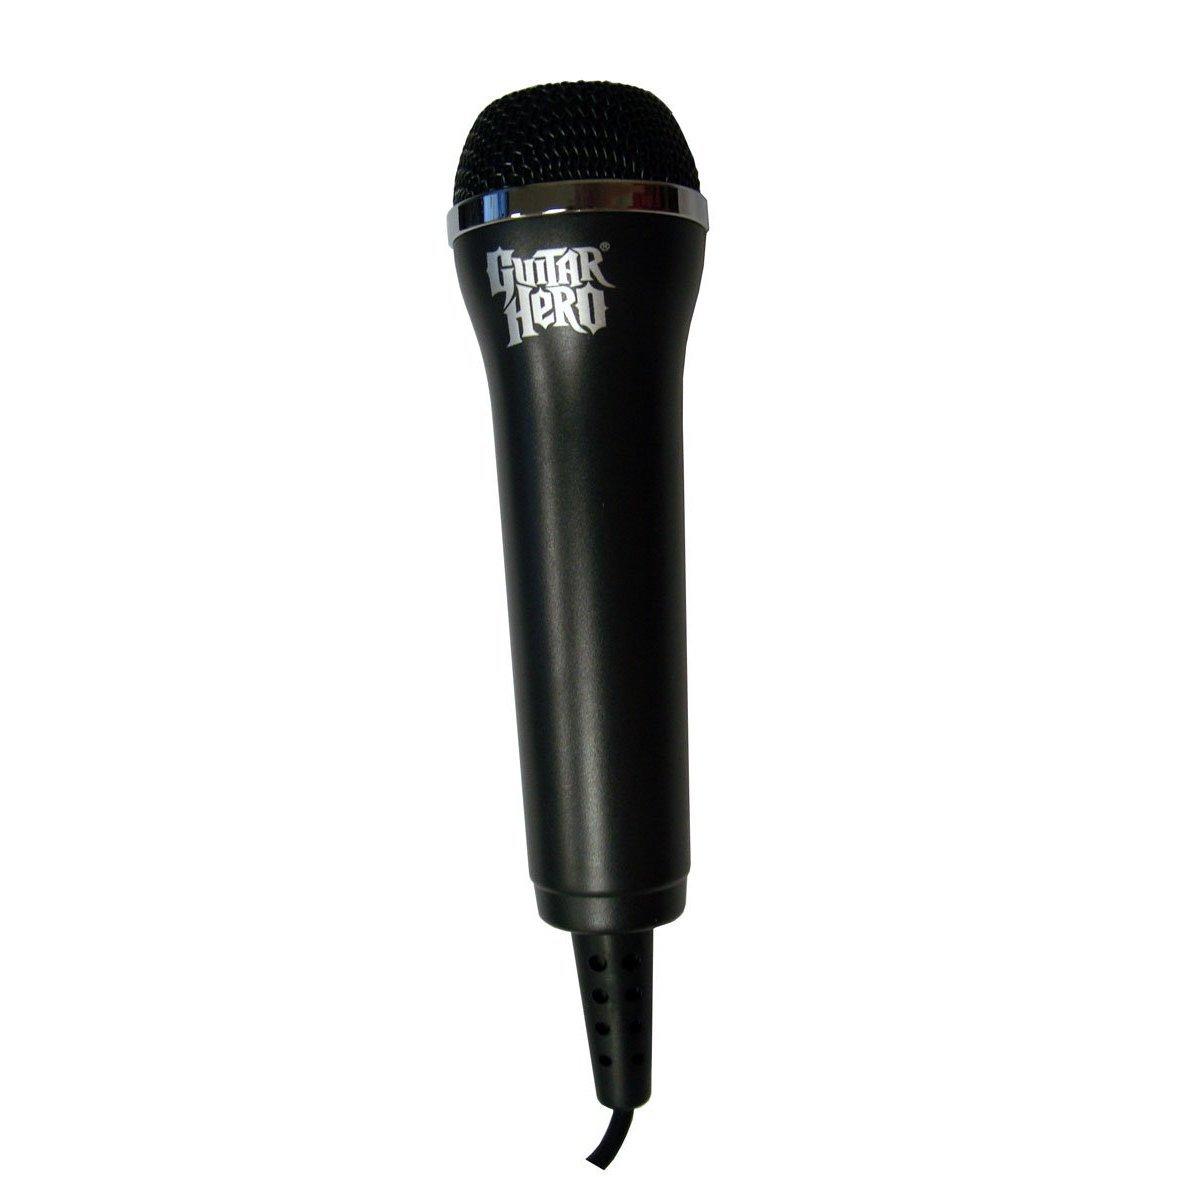 Any USB Microphone